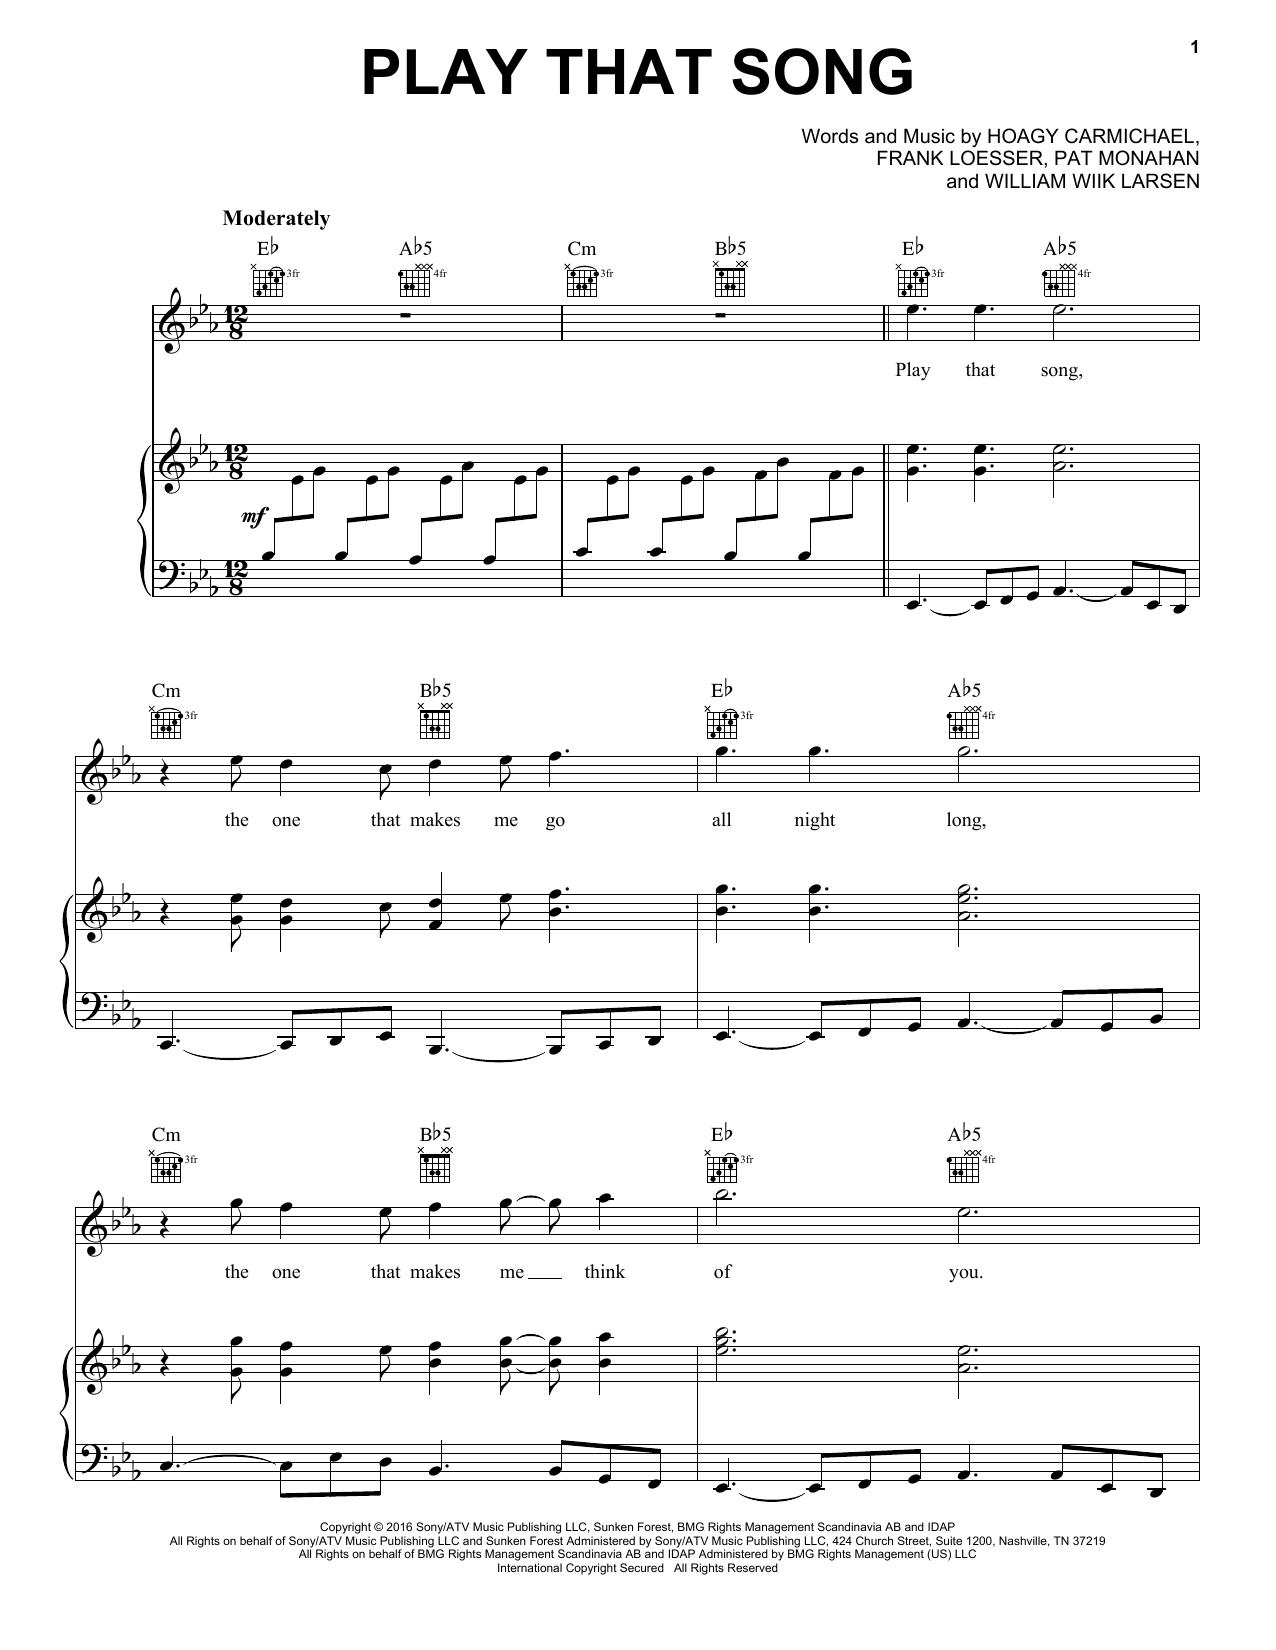 Train 'Play That Song' Sheet Music Notes, Chords | Download Printable Easy  Piano - SKU: 185729